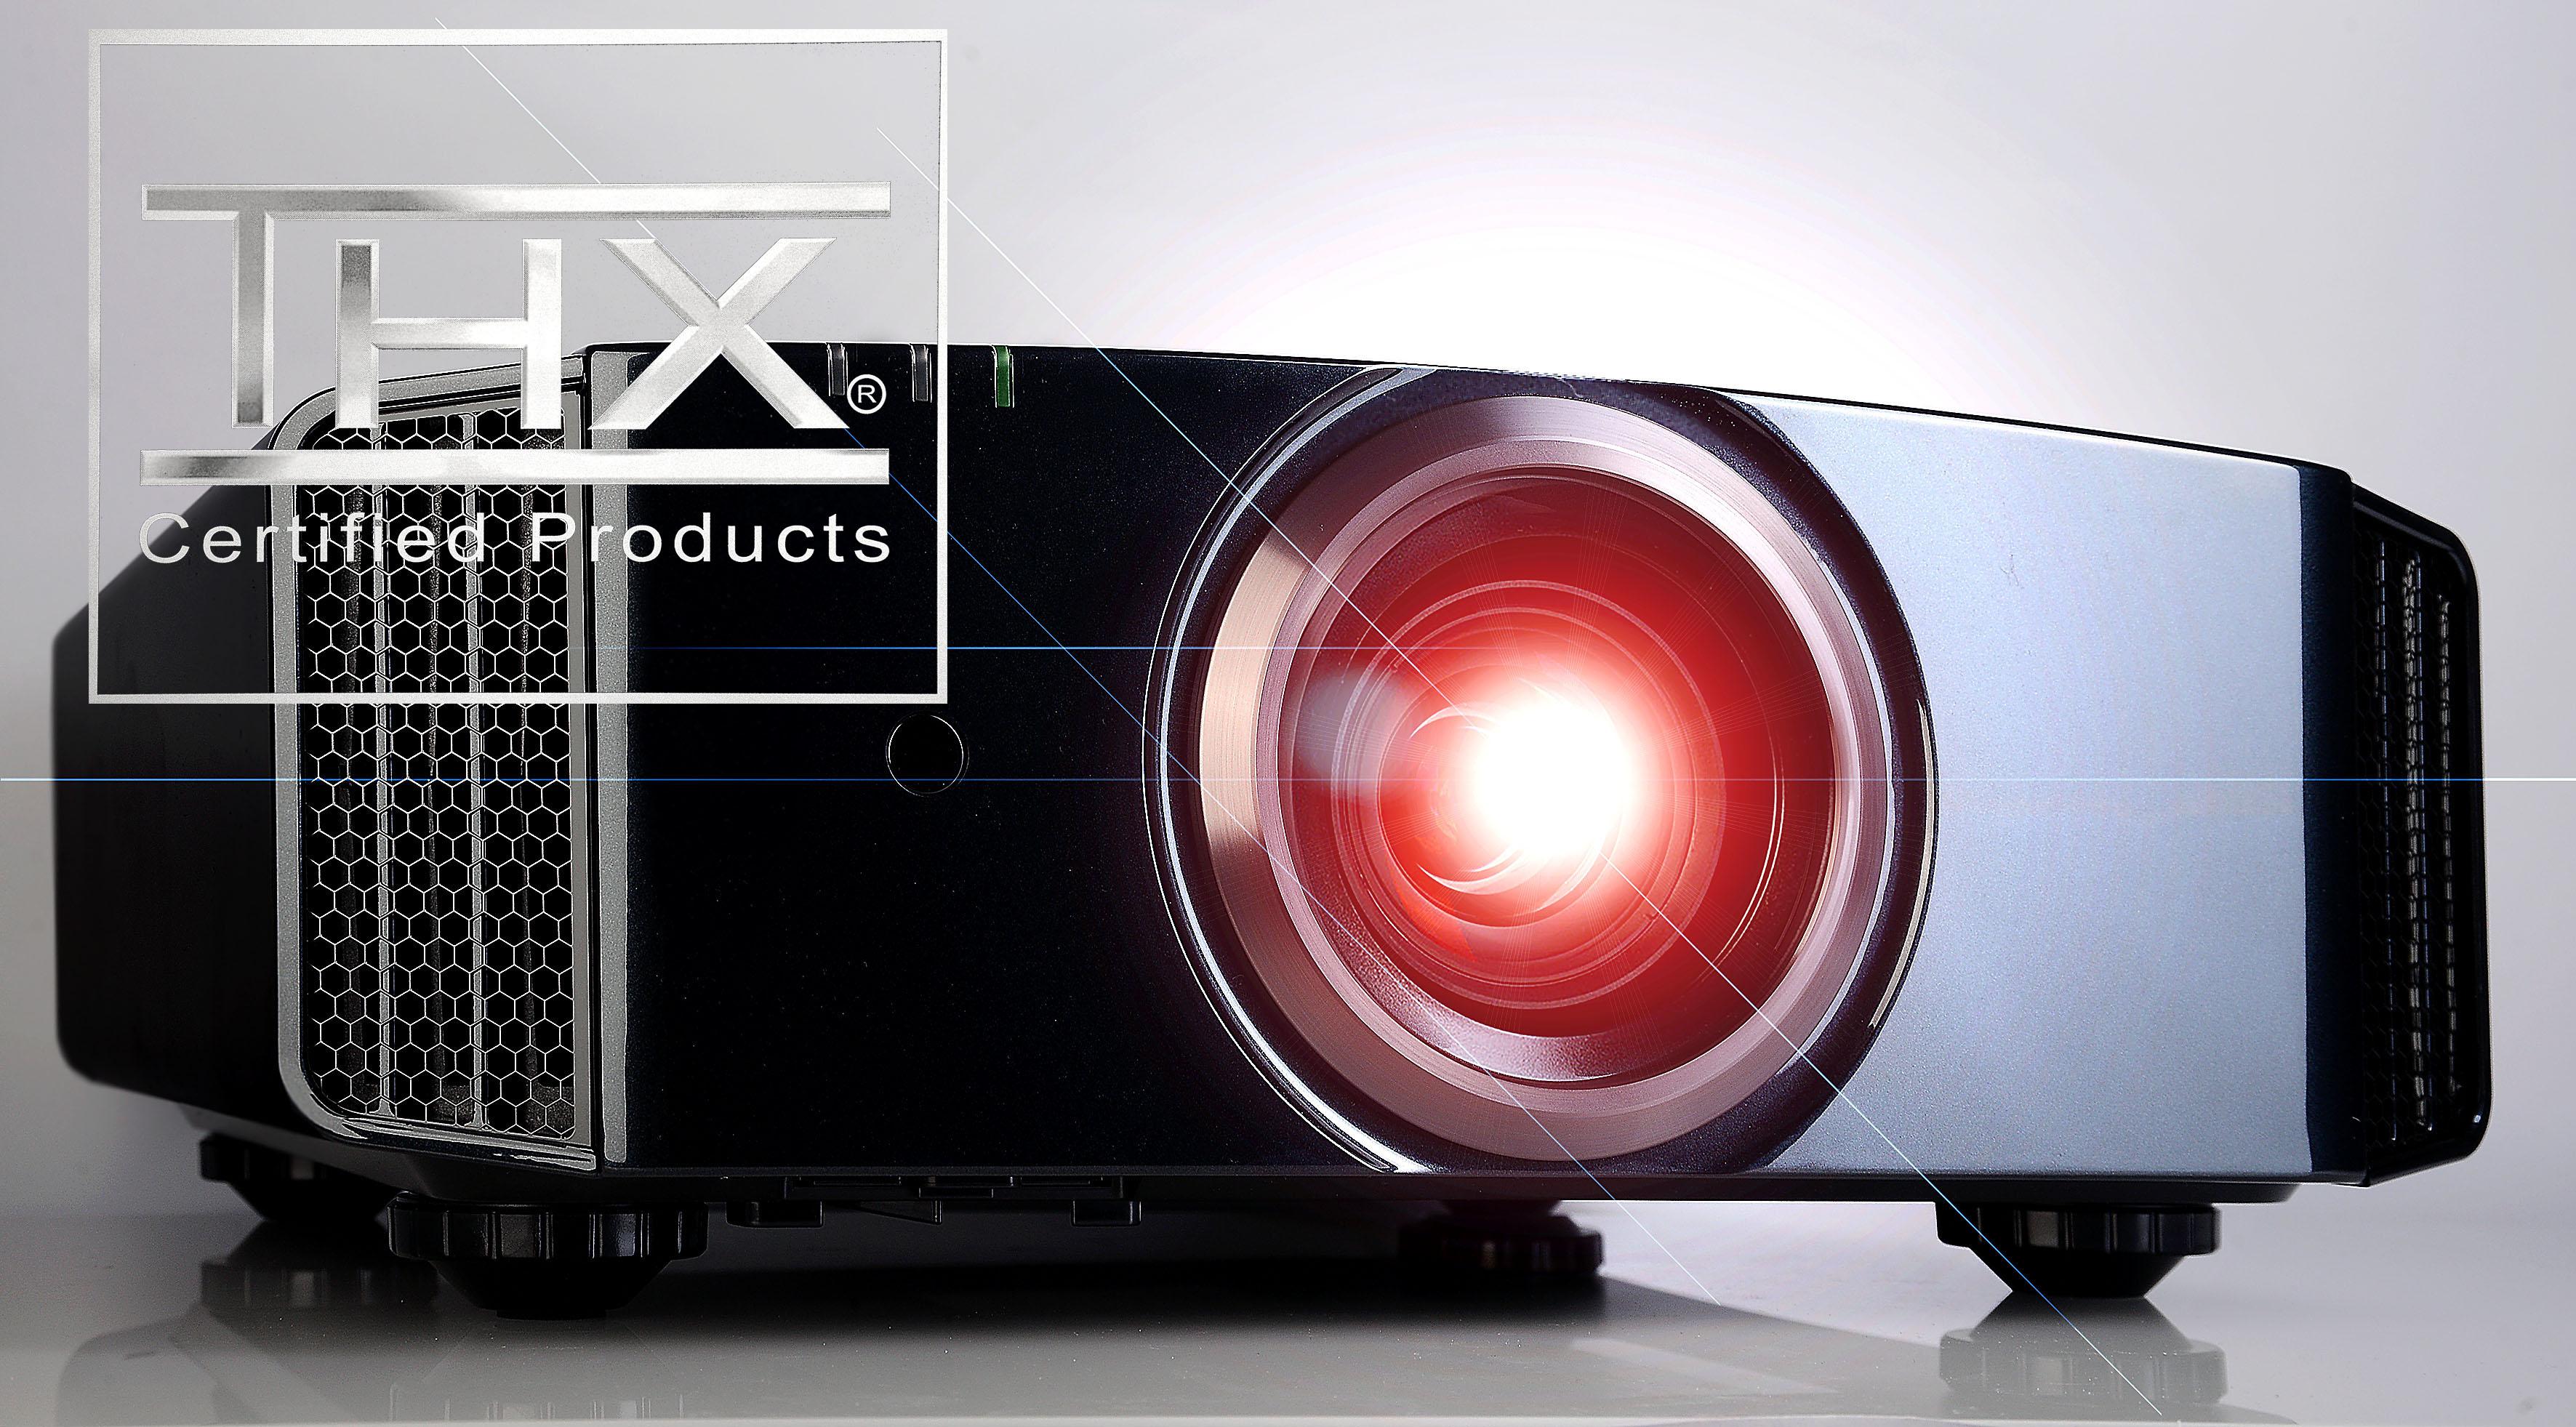 Foto: Michael B. Rehders Den besten Kontrast bietet der THX-lizenzierte JVC DLA-X7900. Er stellt das dunkelste Schwarz dar.